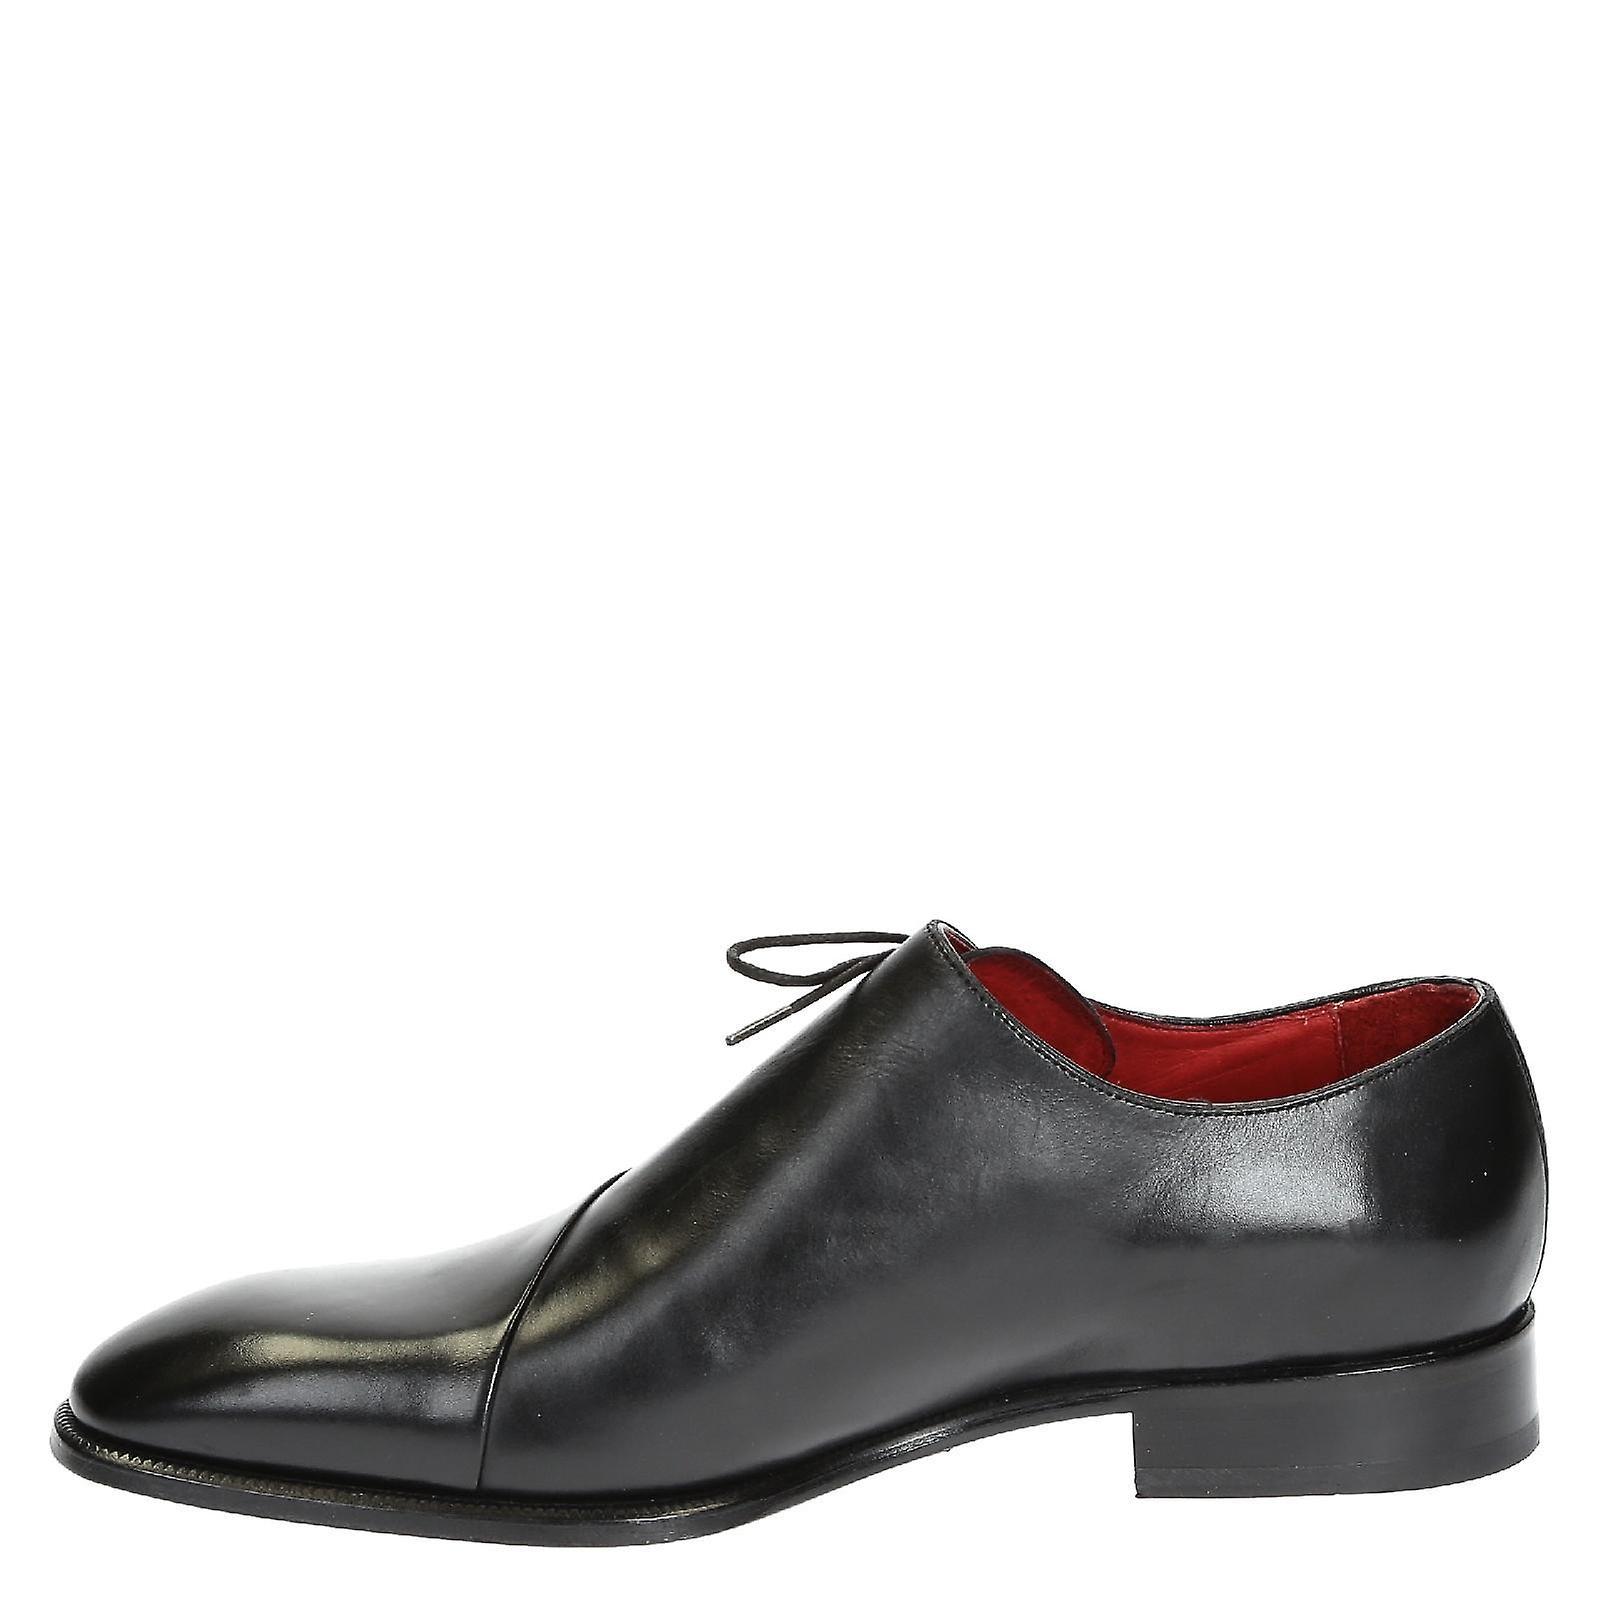 Leonardo Shoes 0688514221formascamontecarlone Men's Black Leather Lace-up Shoes